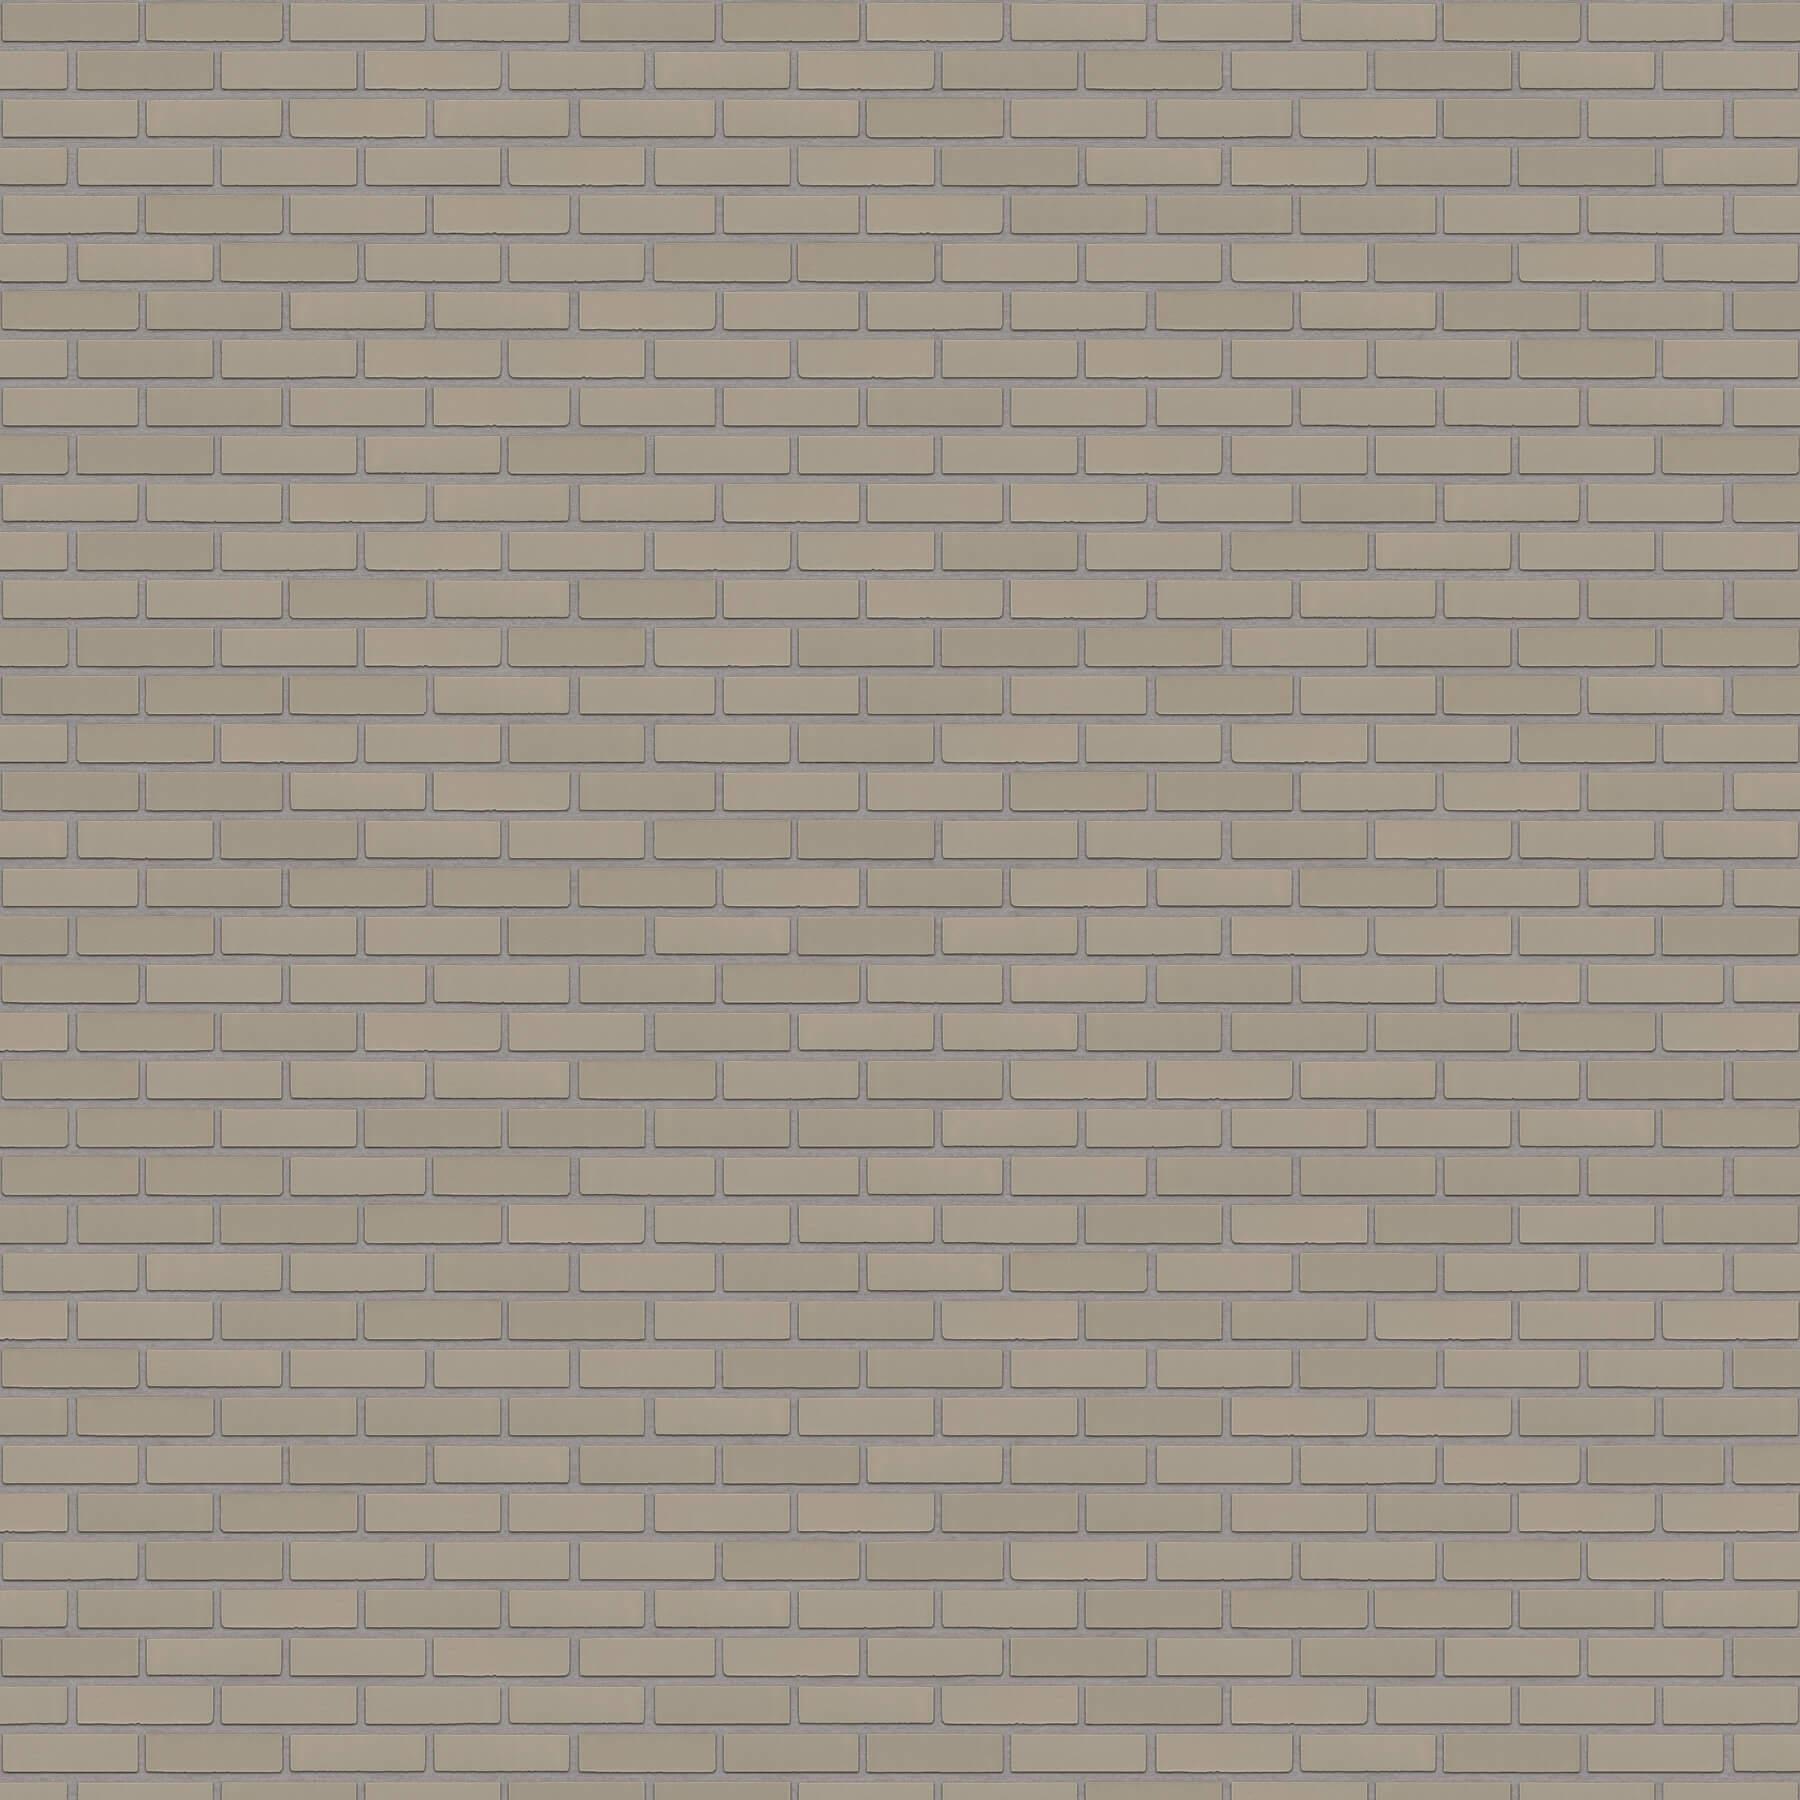 Dekorativna cigla listela FeldHaus Klinker r-800 nf Siva Fuga